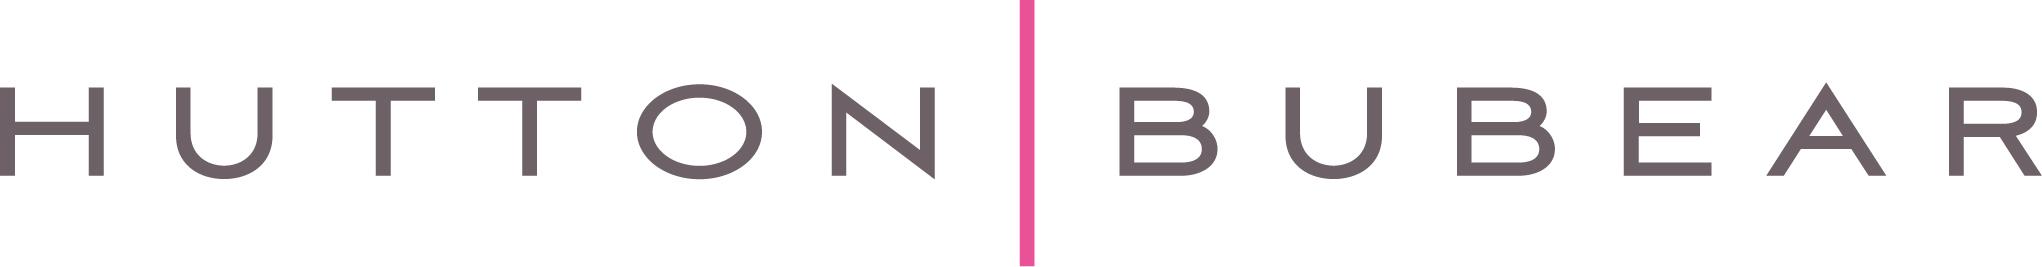 Hutton Bubear logo